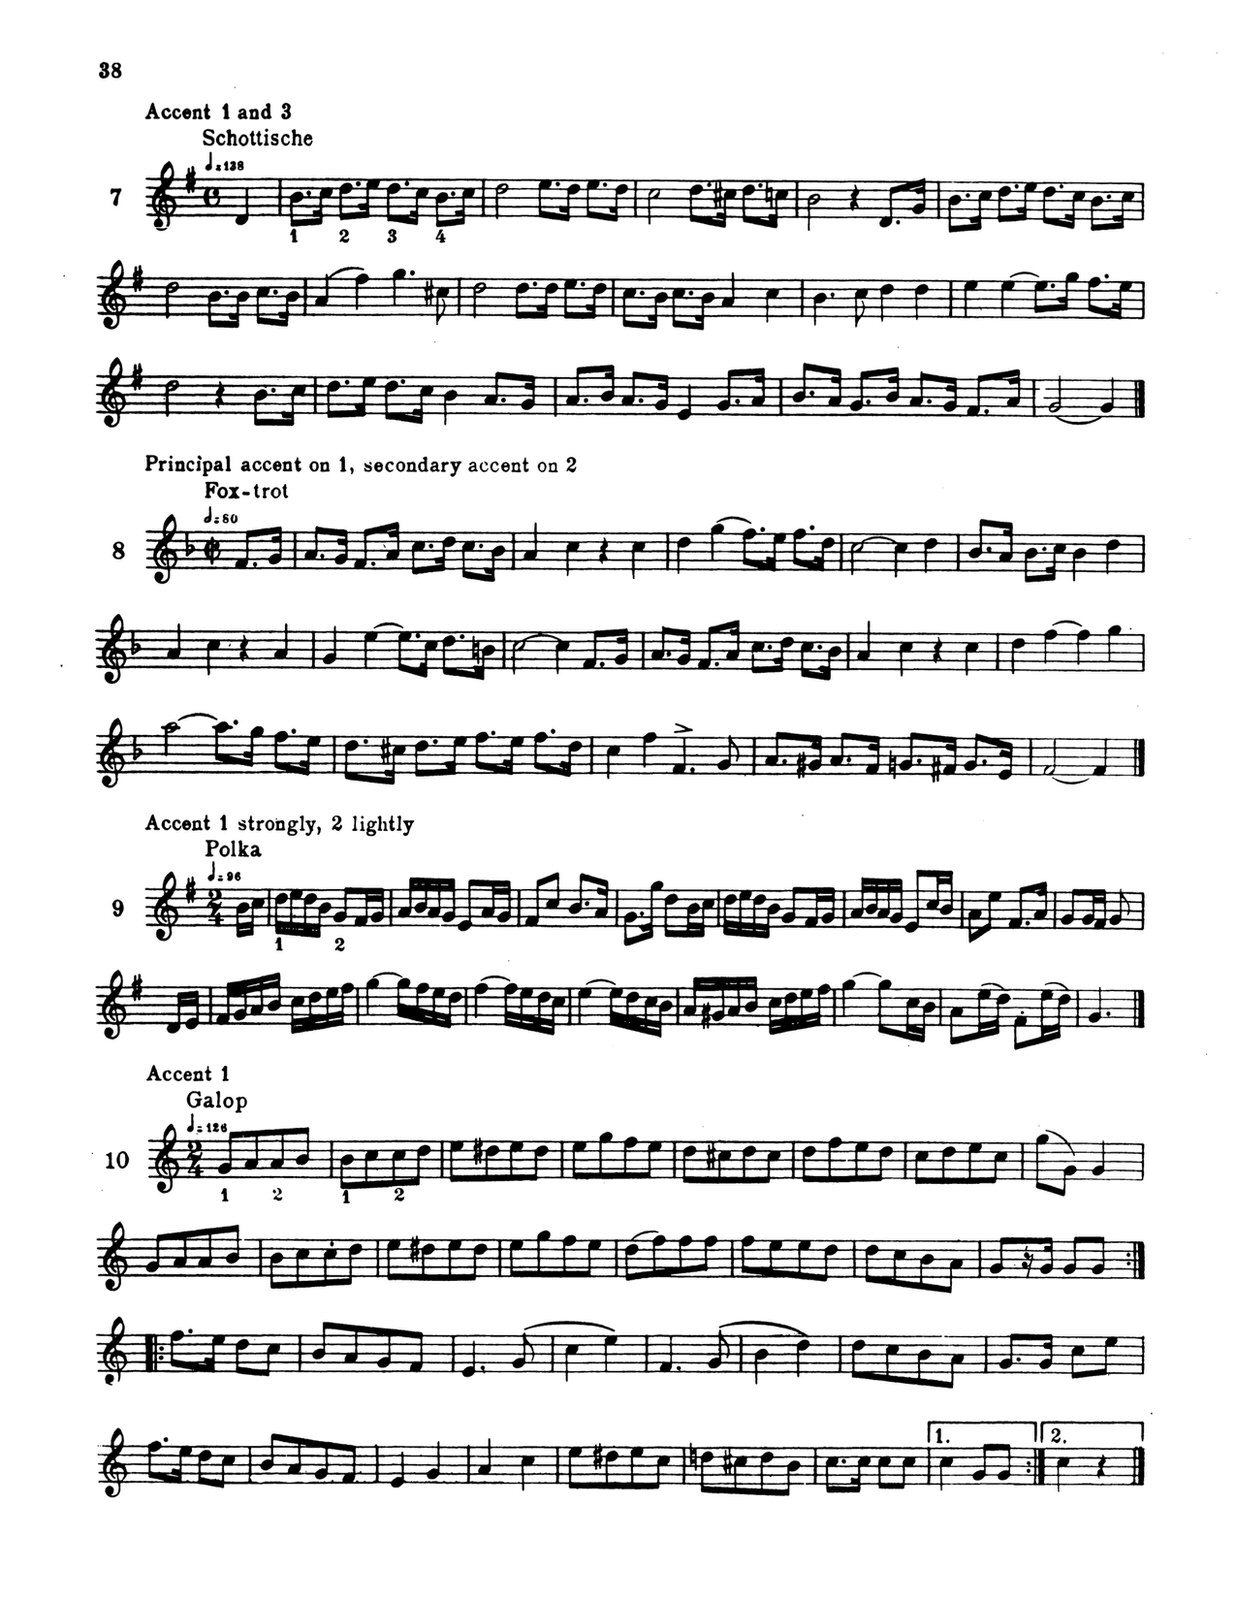 Eby, Walter Scientific Method for Trumpet Volume 2 4